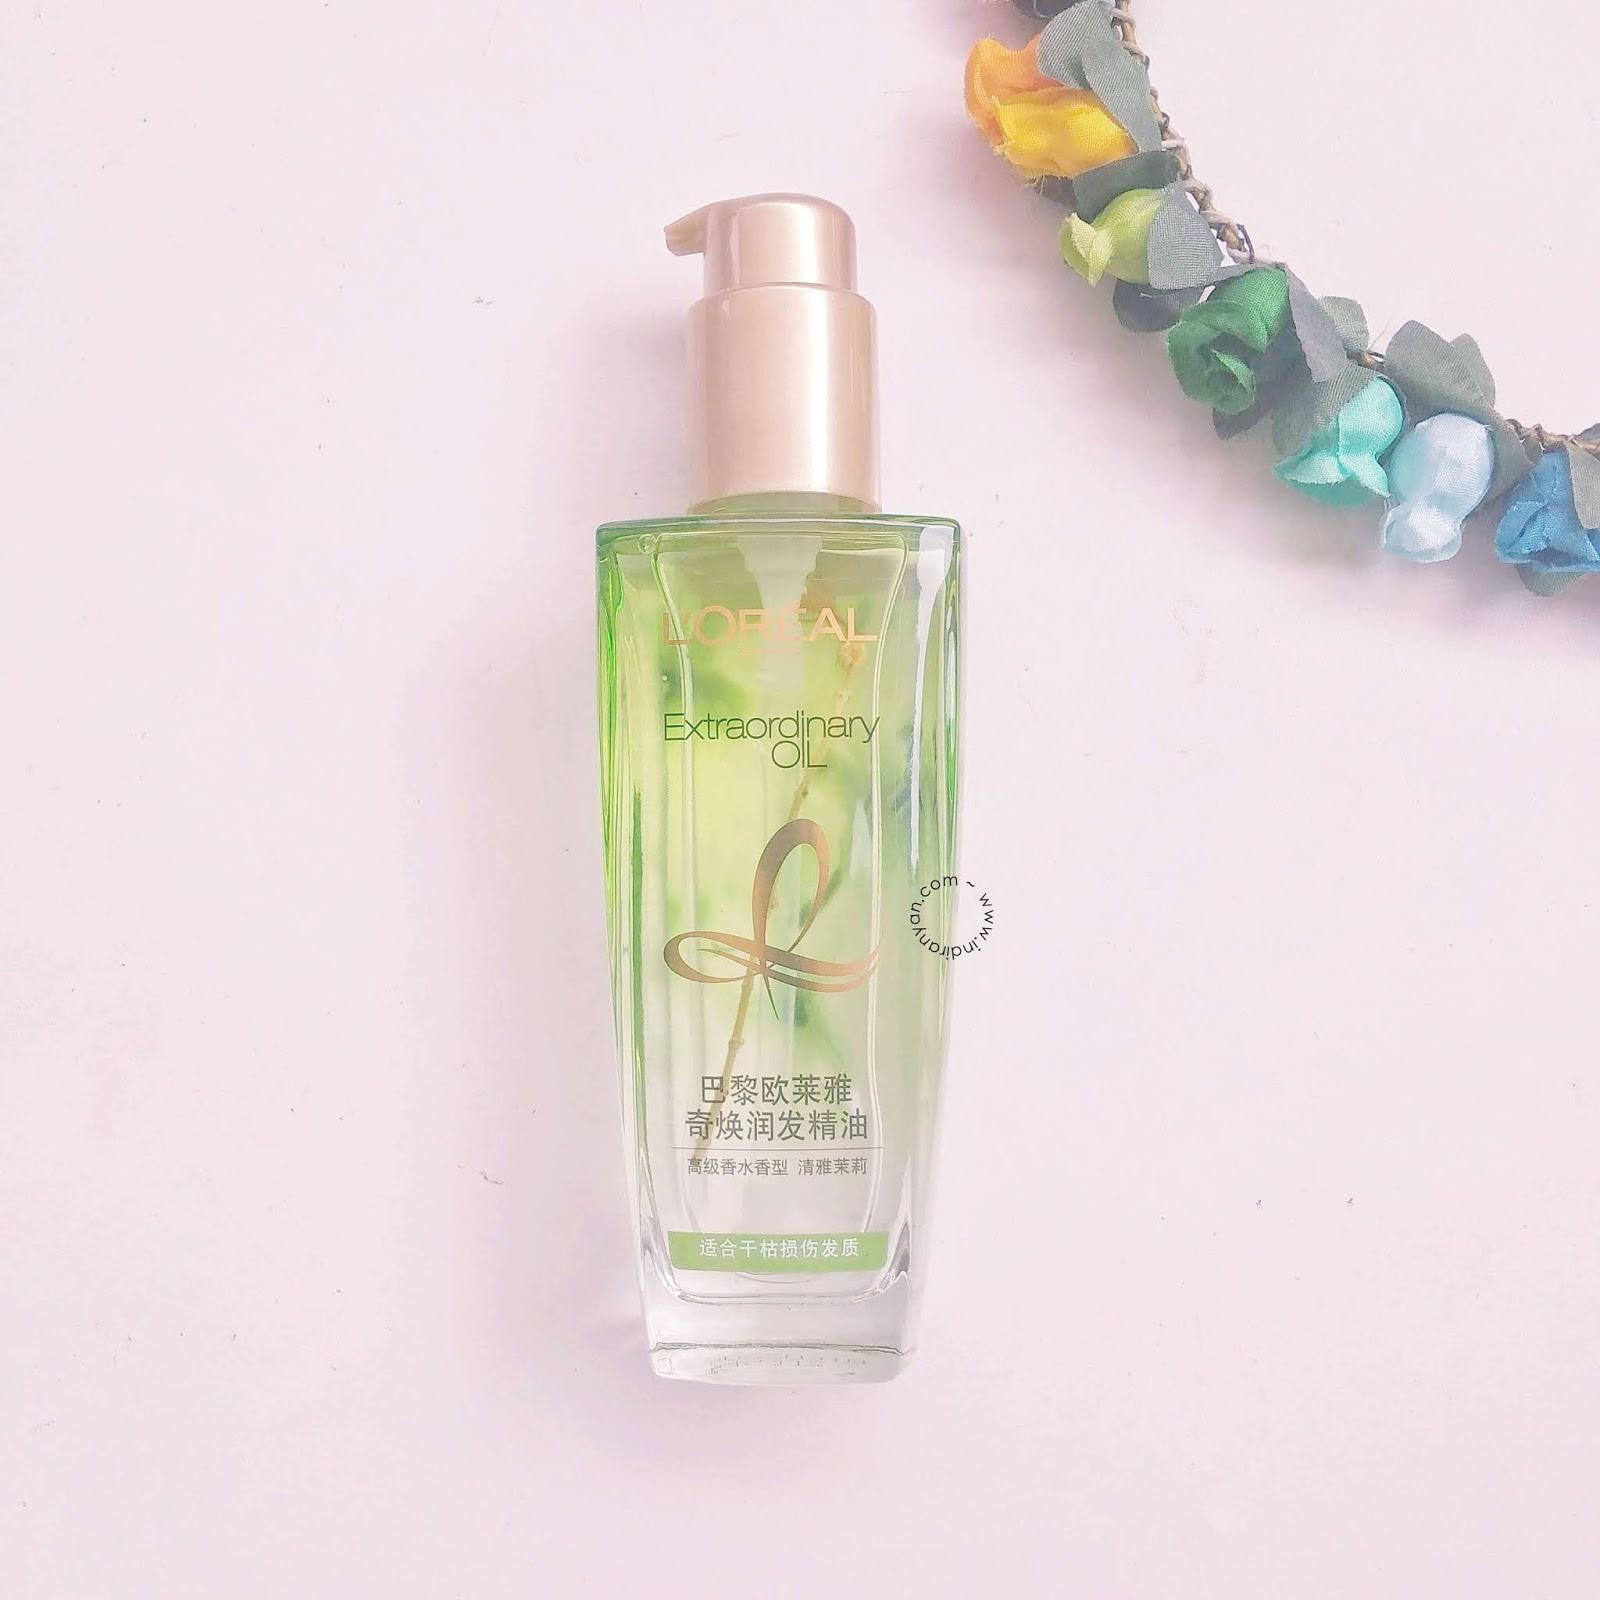 loreal-extraordinary-oil-floral-jasmine